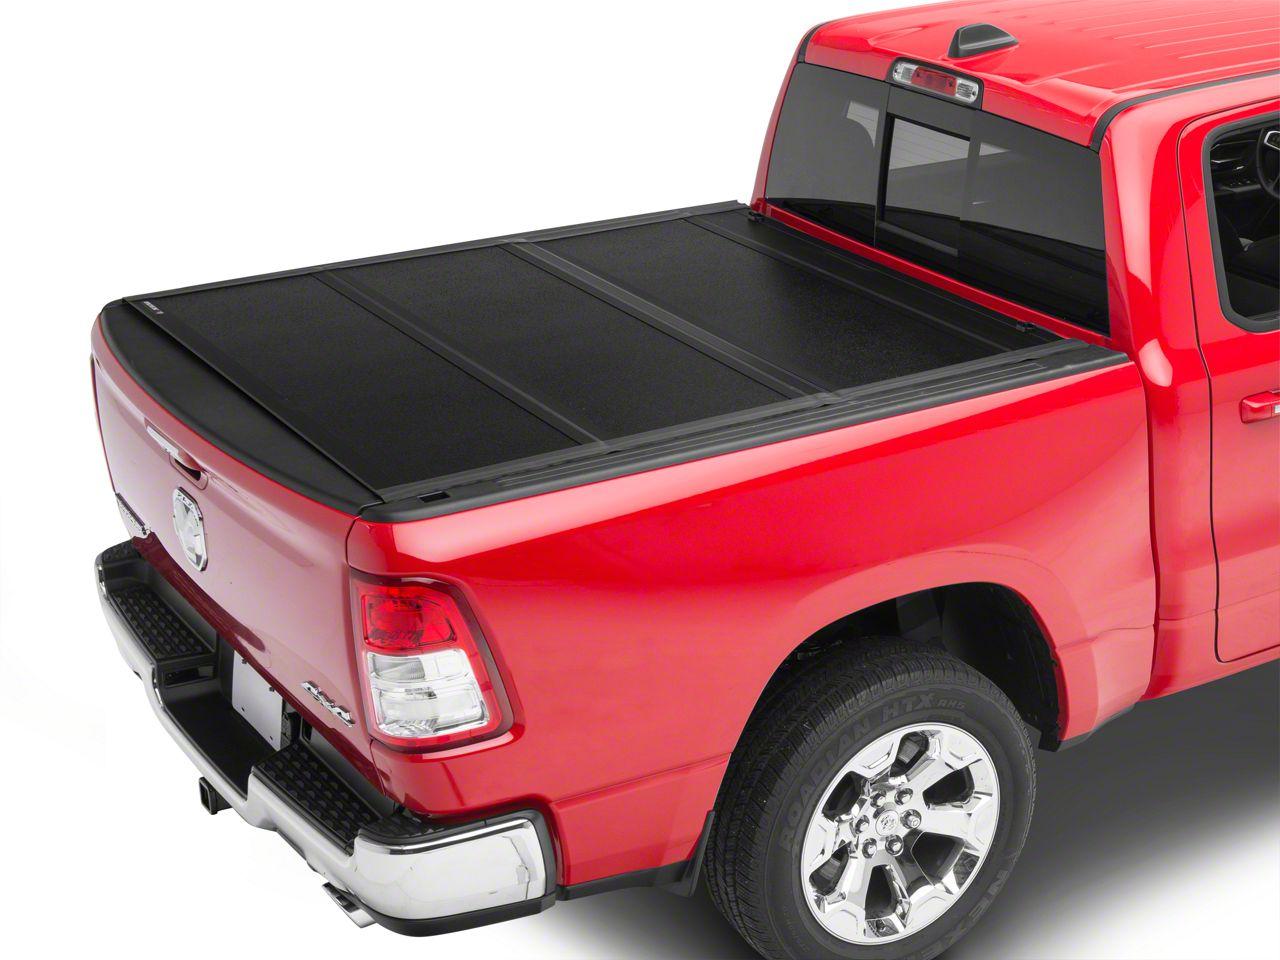 UnderCover Flex Tonneau Cover (2019 RAM 1500 w/o RAM Box)